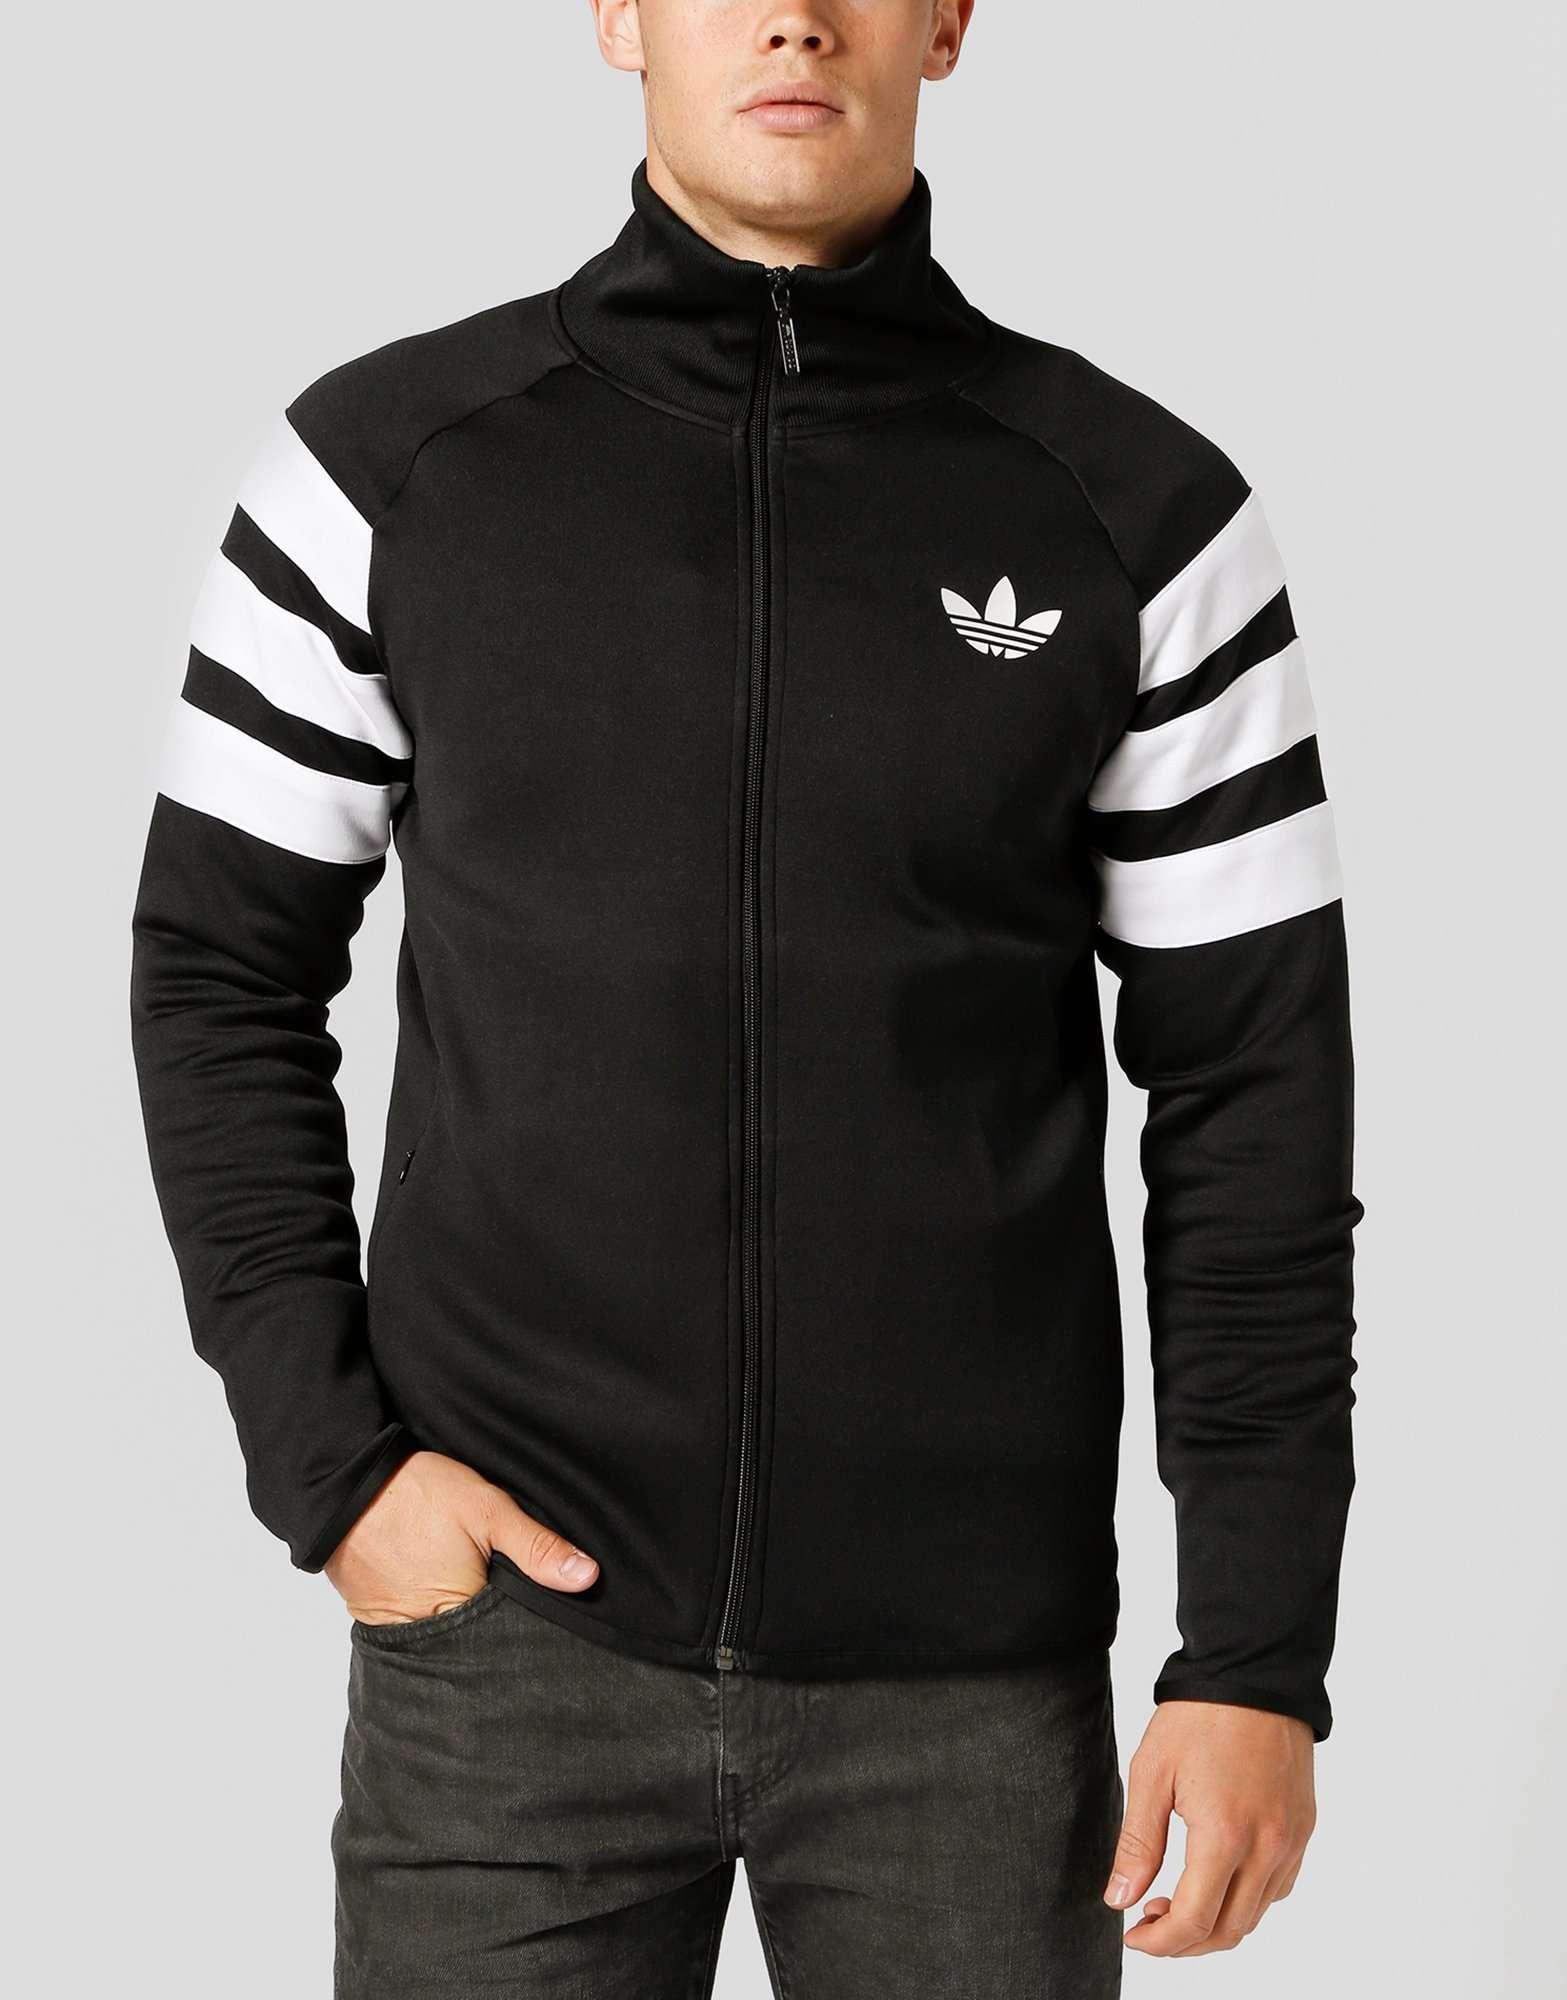 Adidas Originals Trefoil 3 Stripe Track Top Scotts Menswear